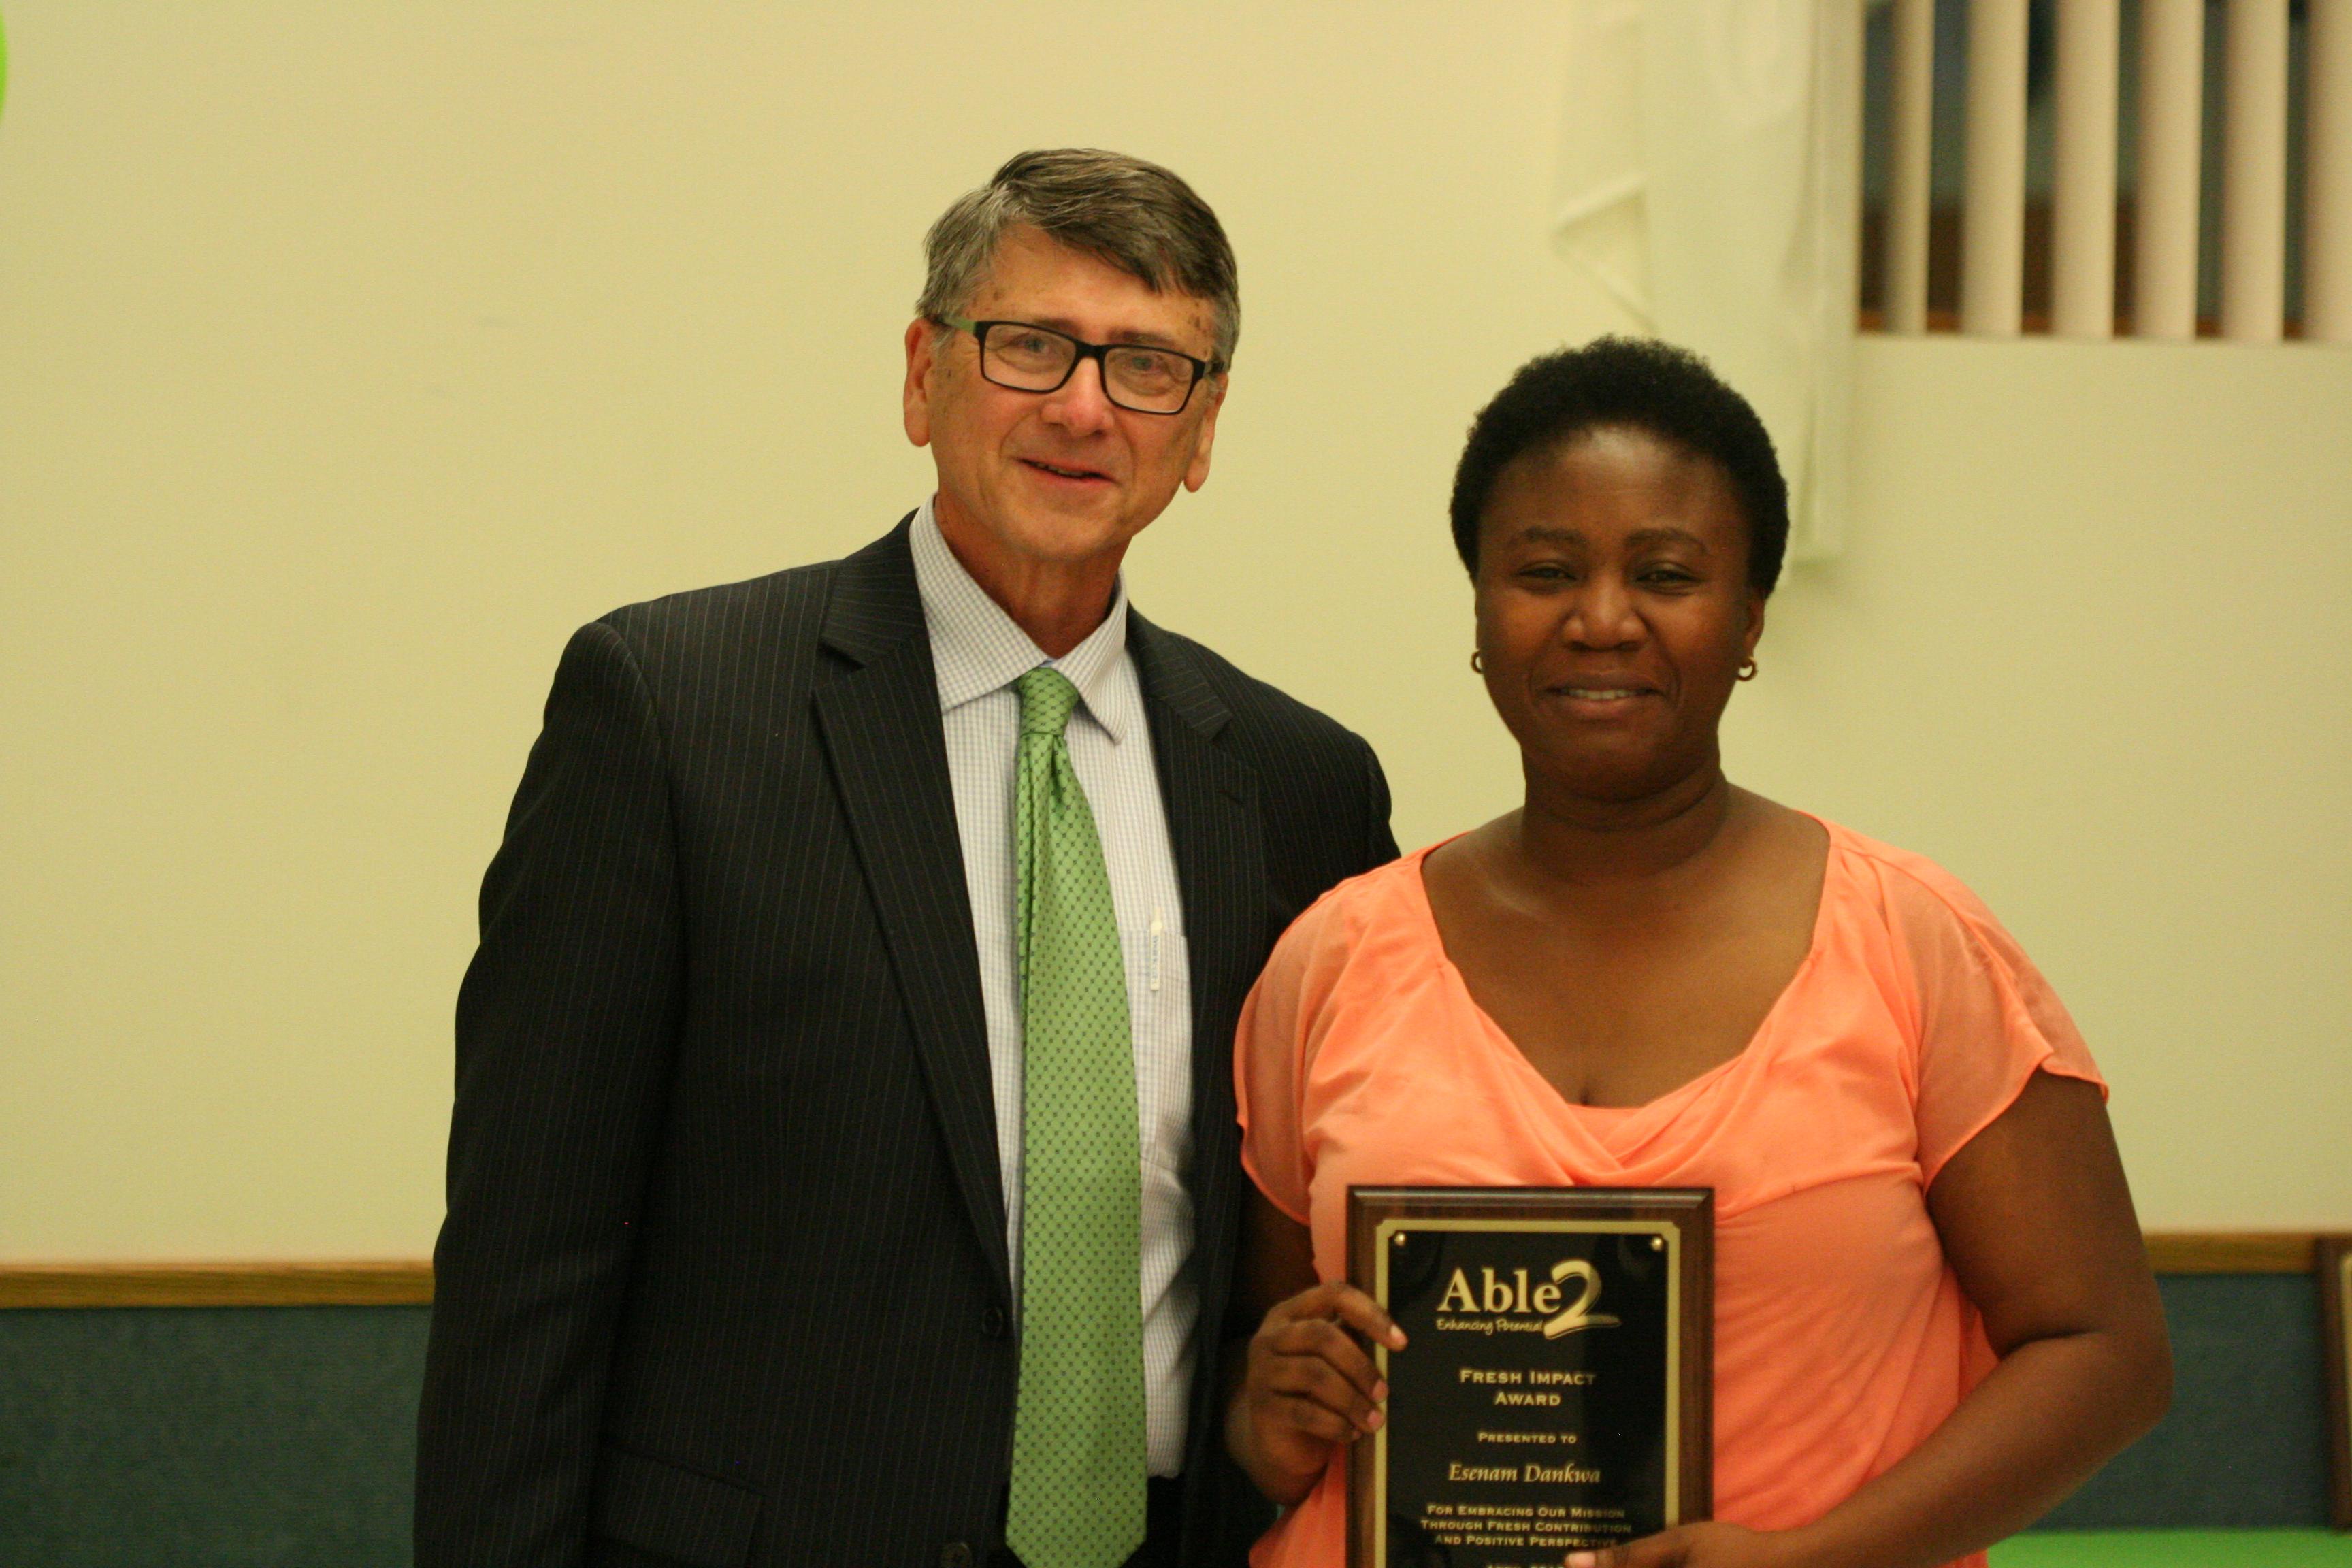 Esenam Dankwa, Fresh Impact Award Recipient